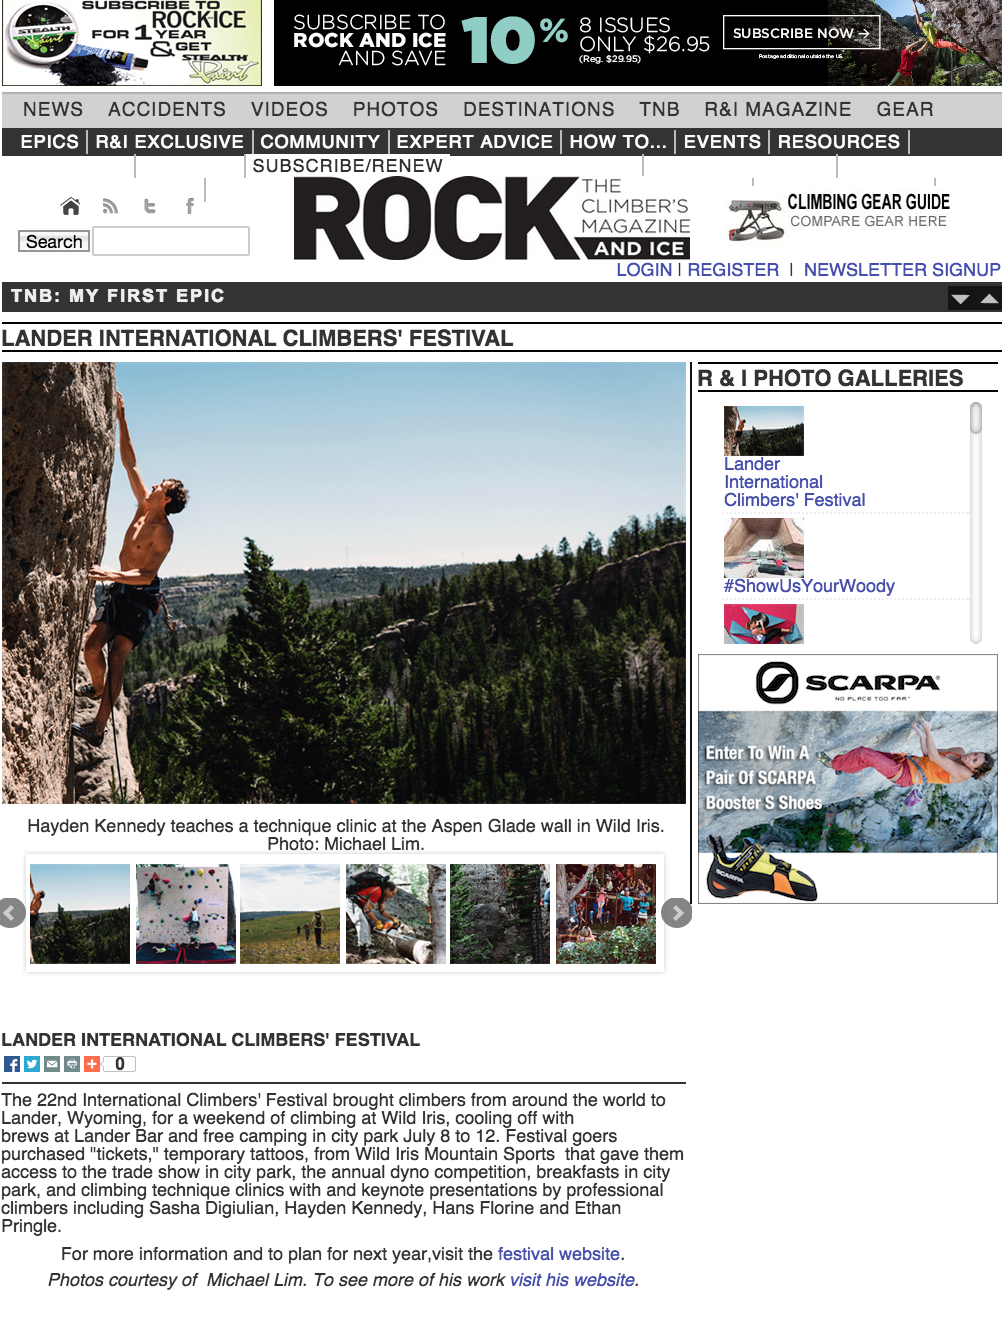 Rock & Ice: International Climber's Festival